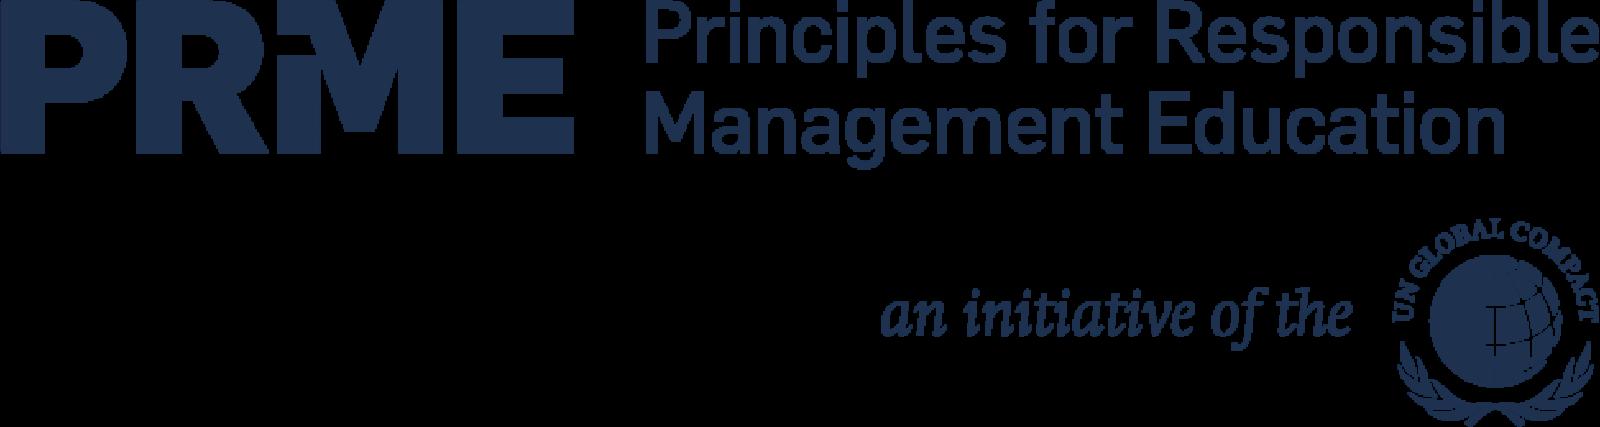 PRME-logo_most-recent